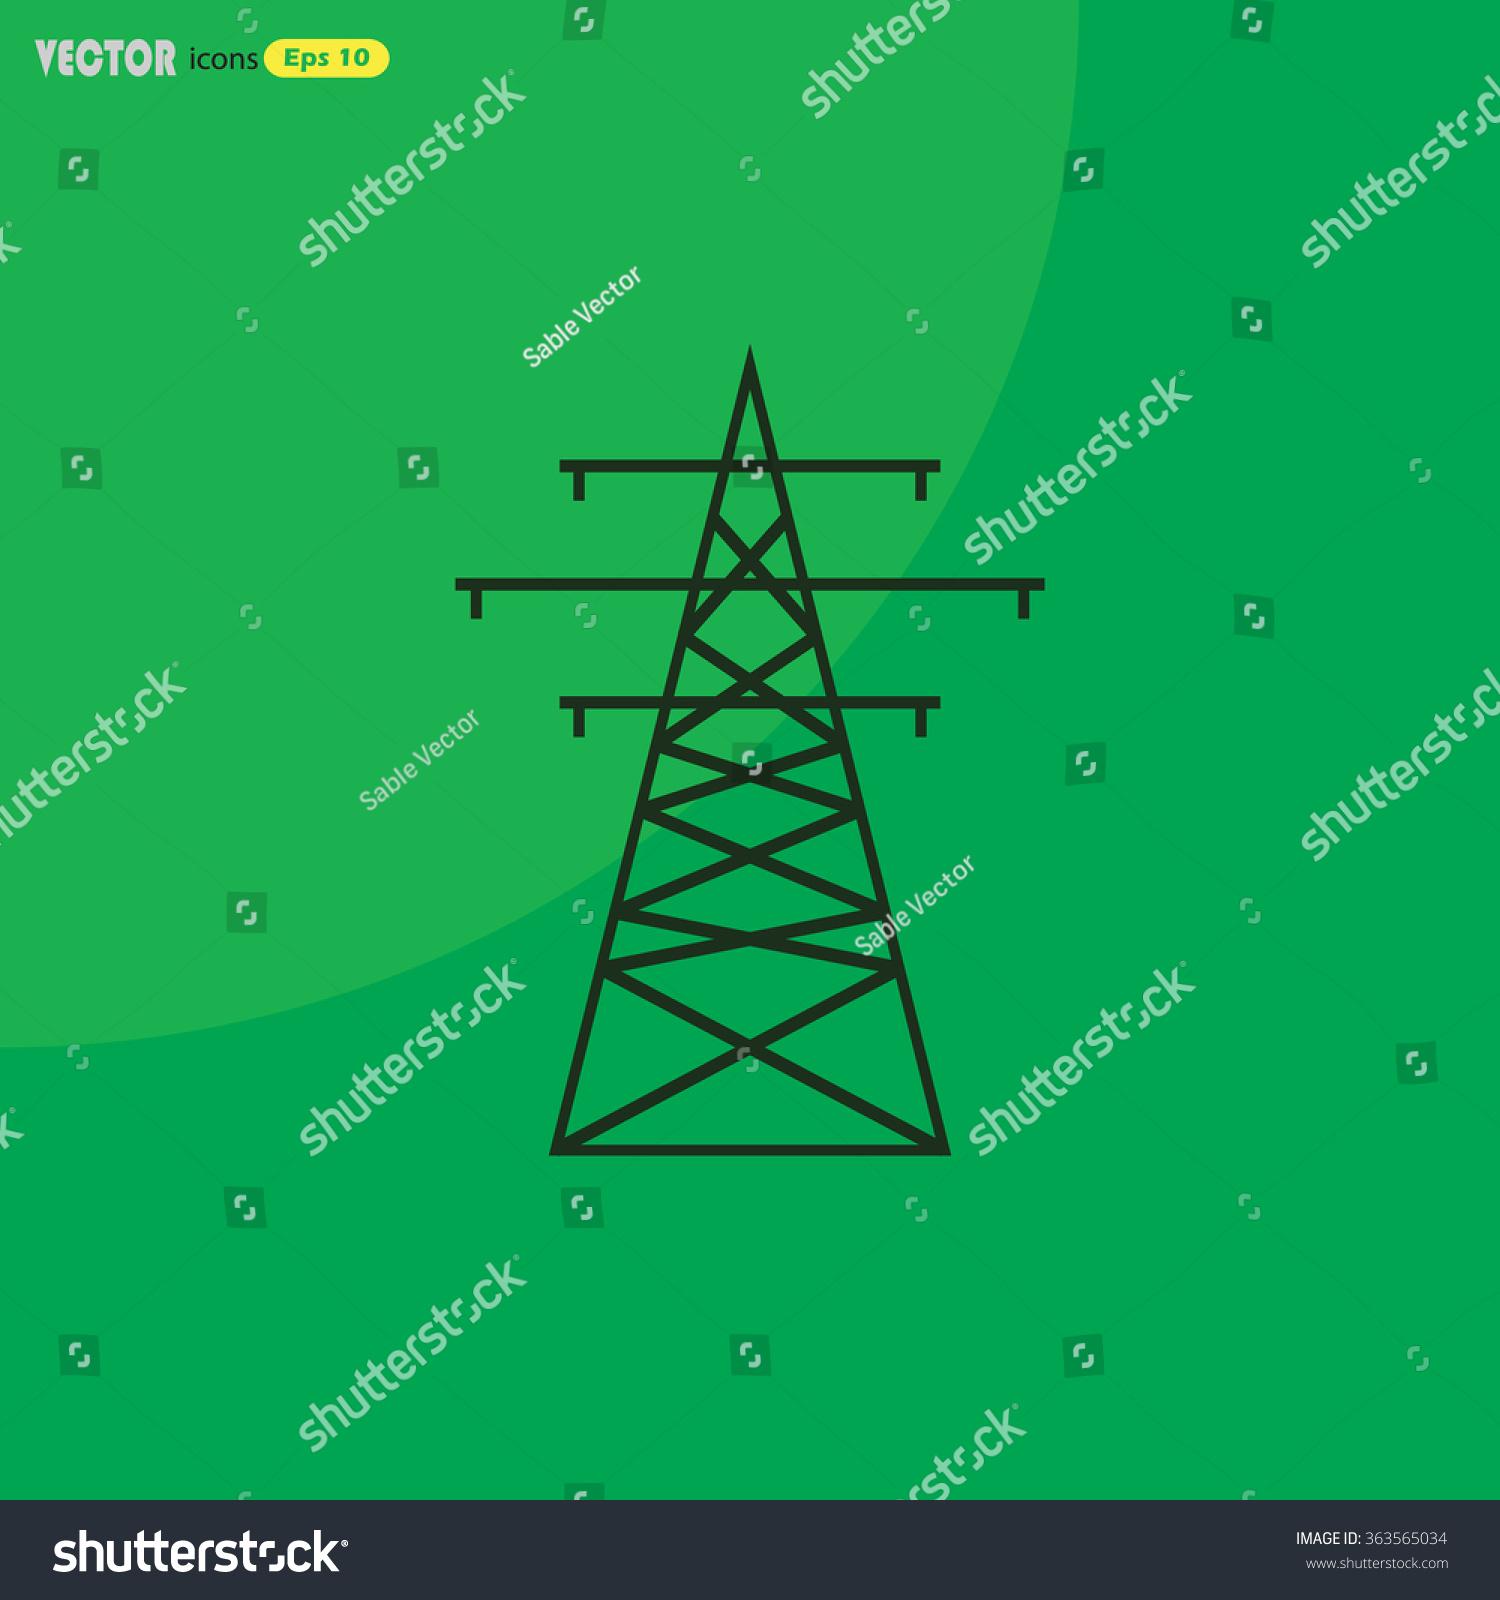 Triangle Wire Pole - Dolgular.com